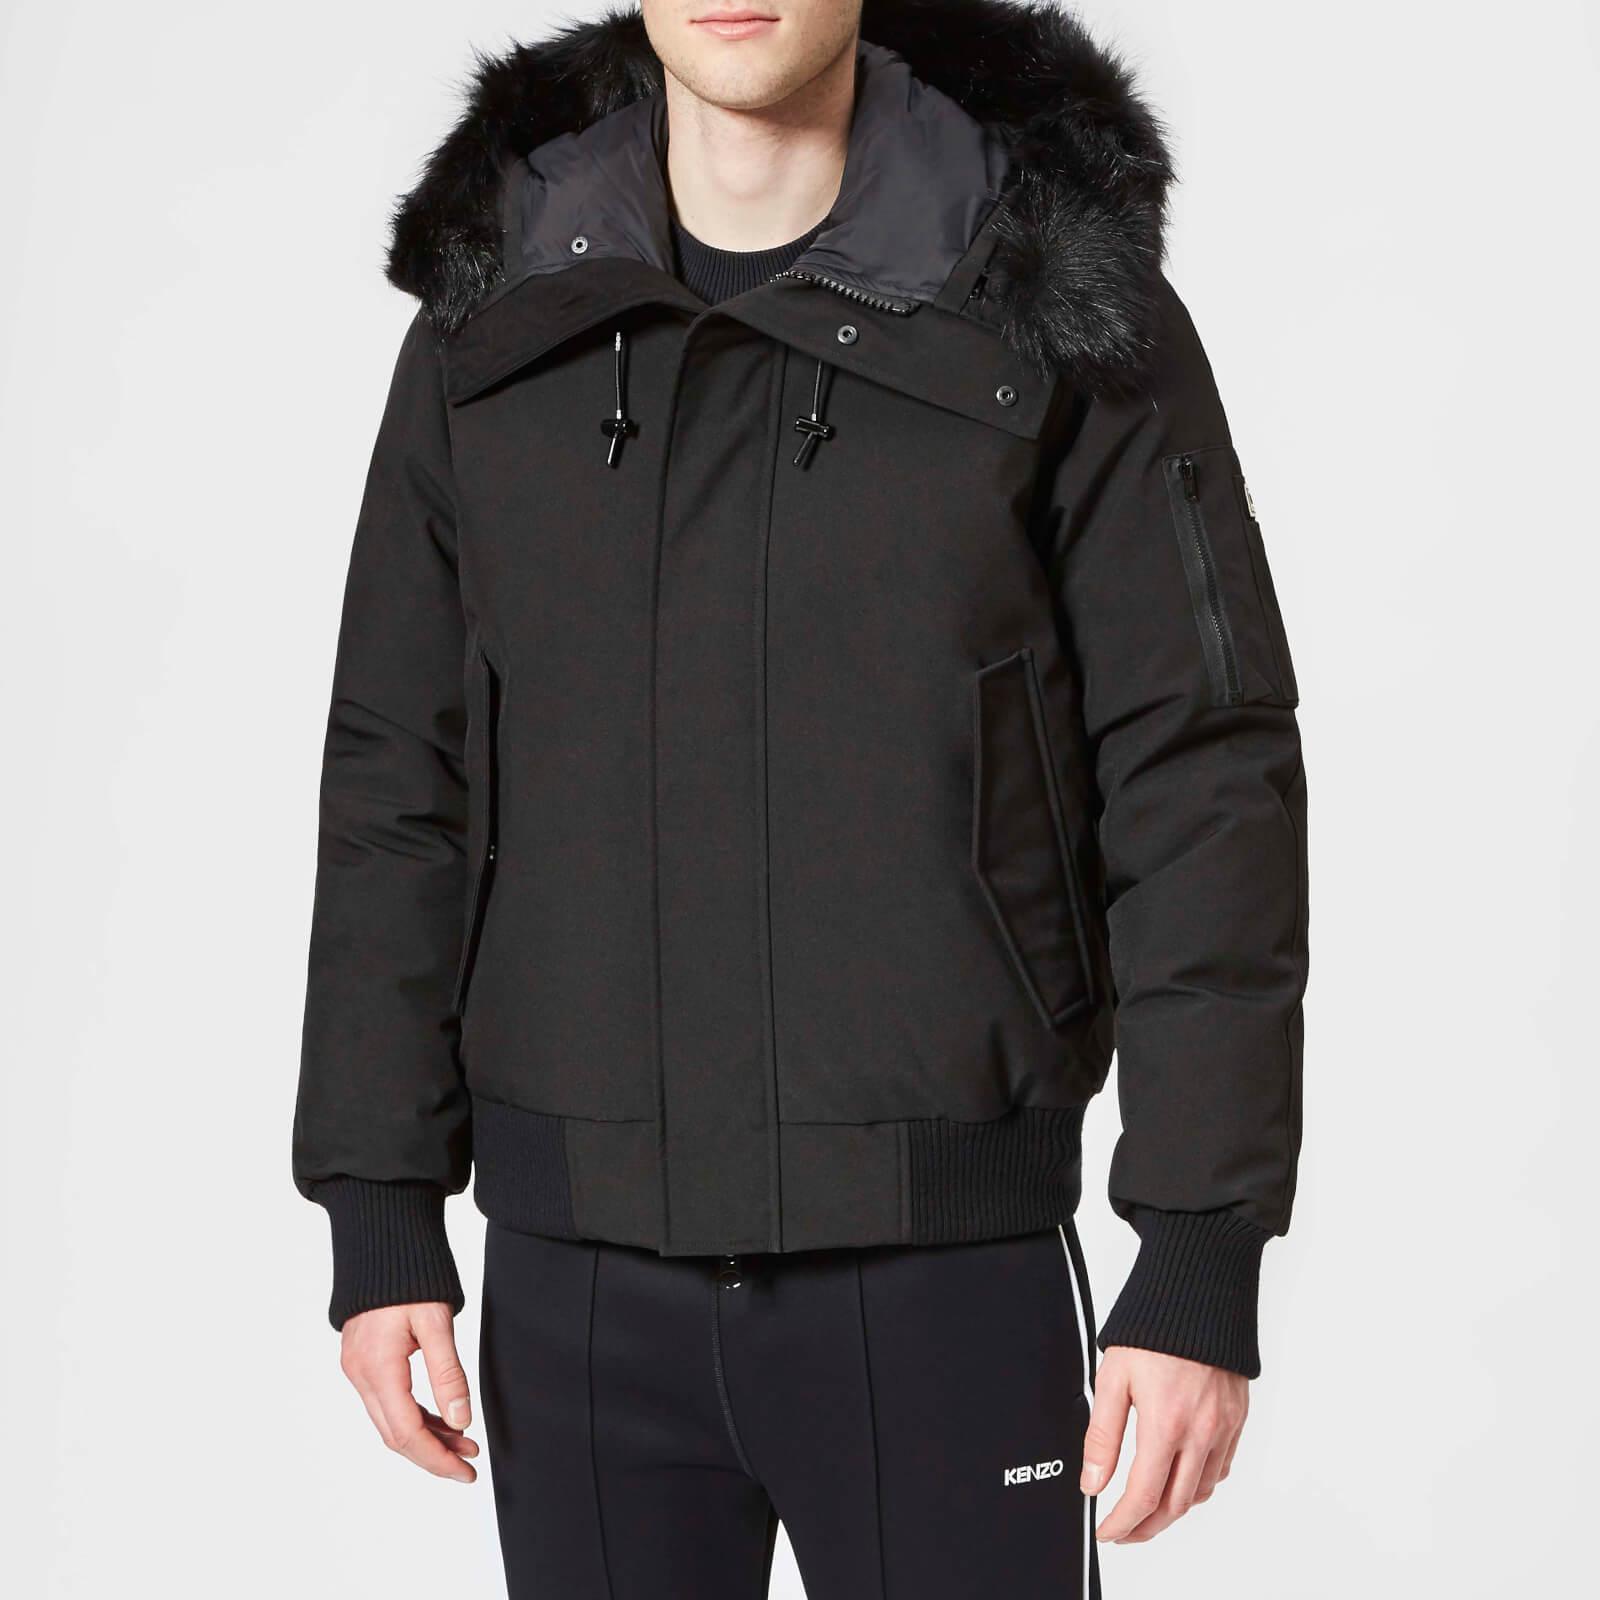 e6705d3d64 KENZO Men's Faux Fur Bomber Jacket - Black